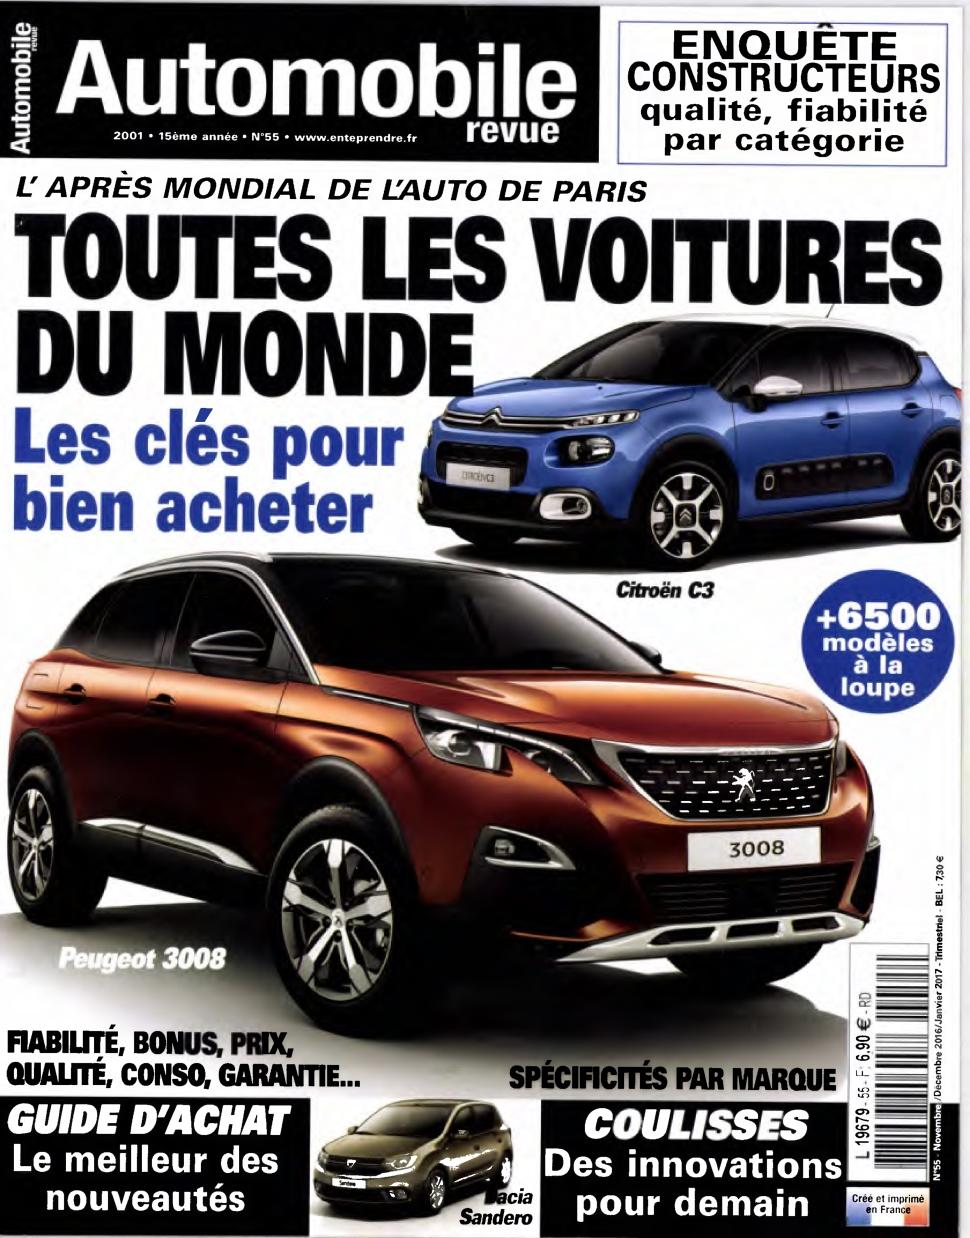 Automobile revue 55 - Novembre 2016 - Janvier 2017